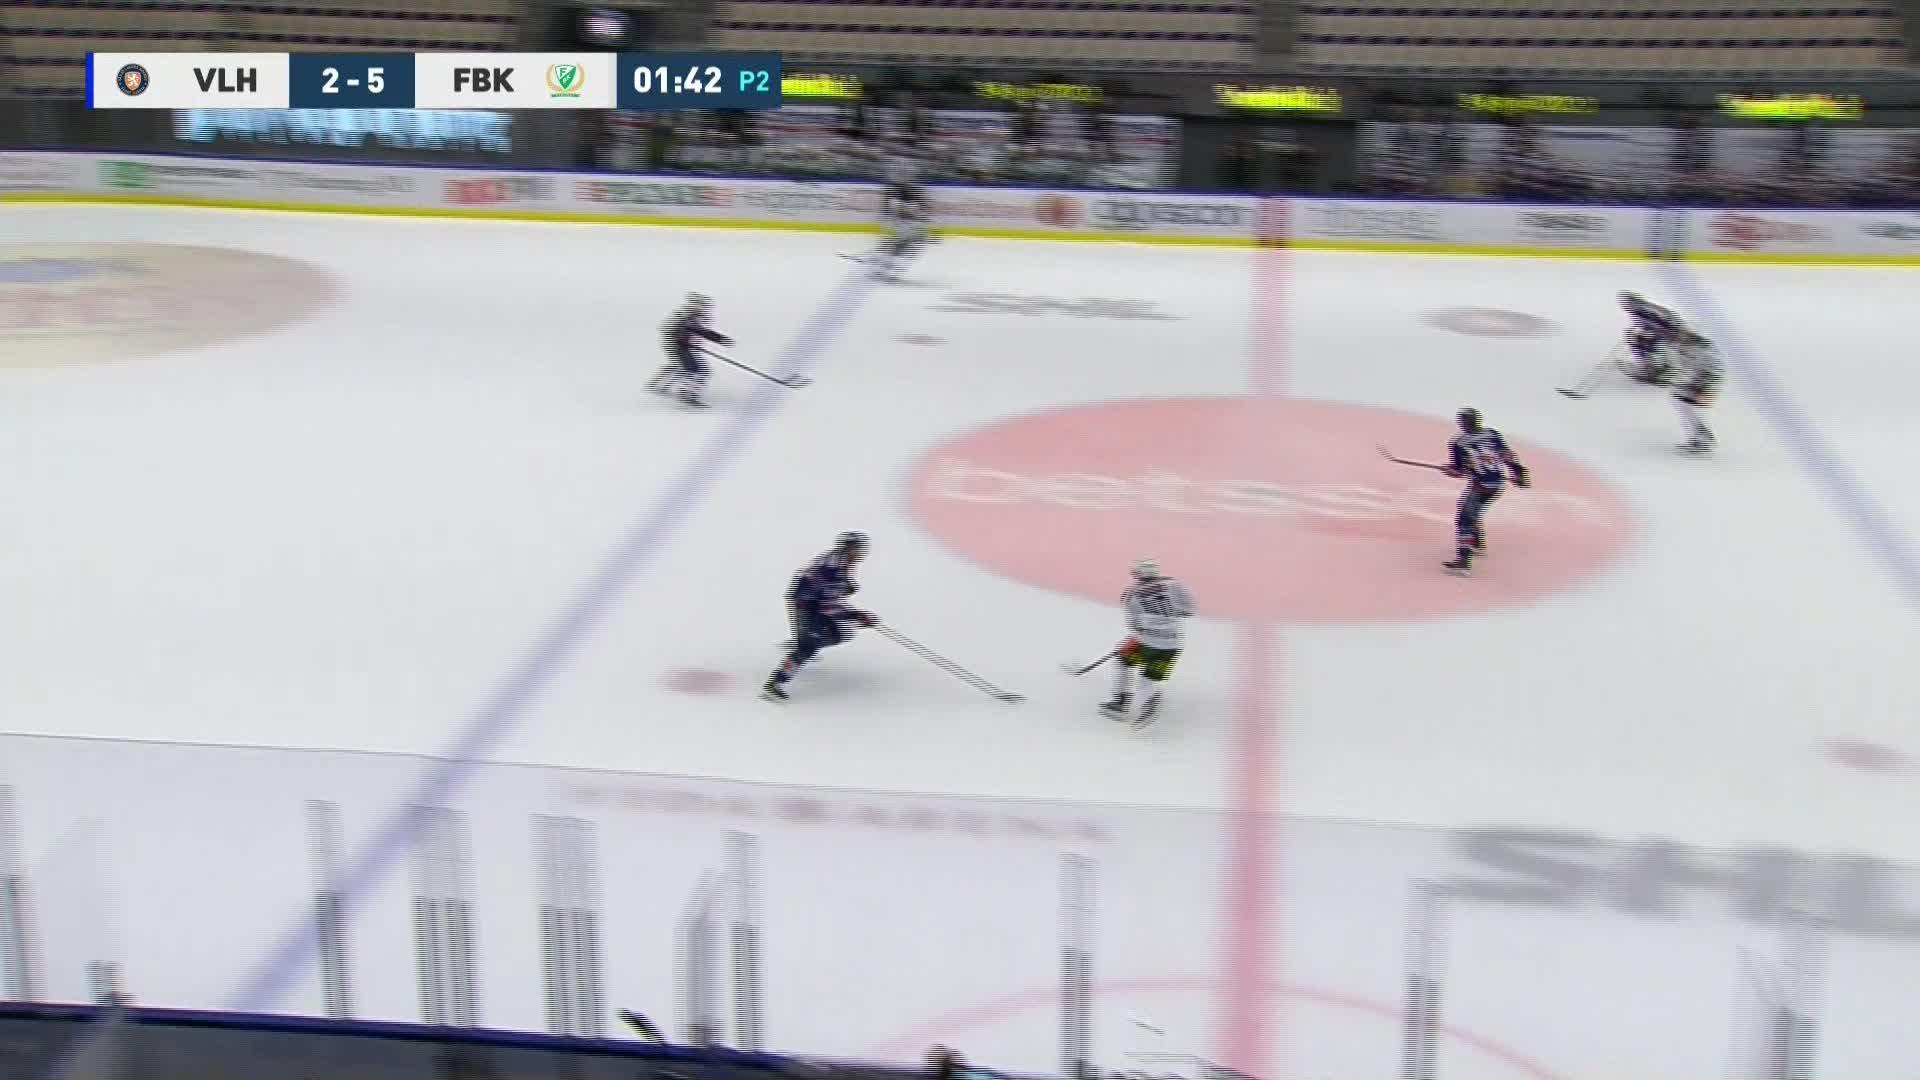 Växjö Lakers - Färjestad BK 2-6